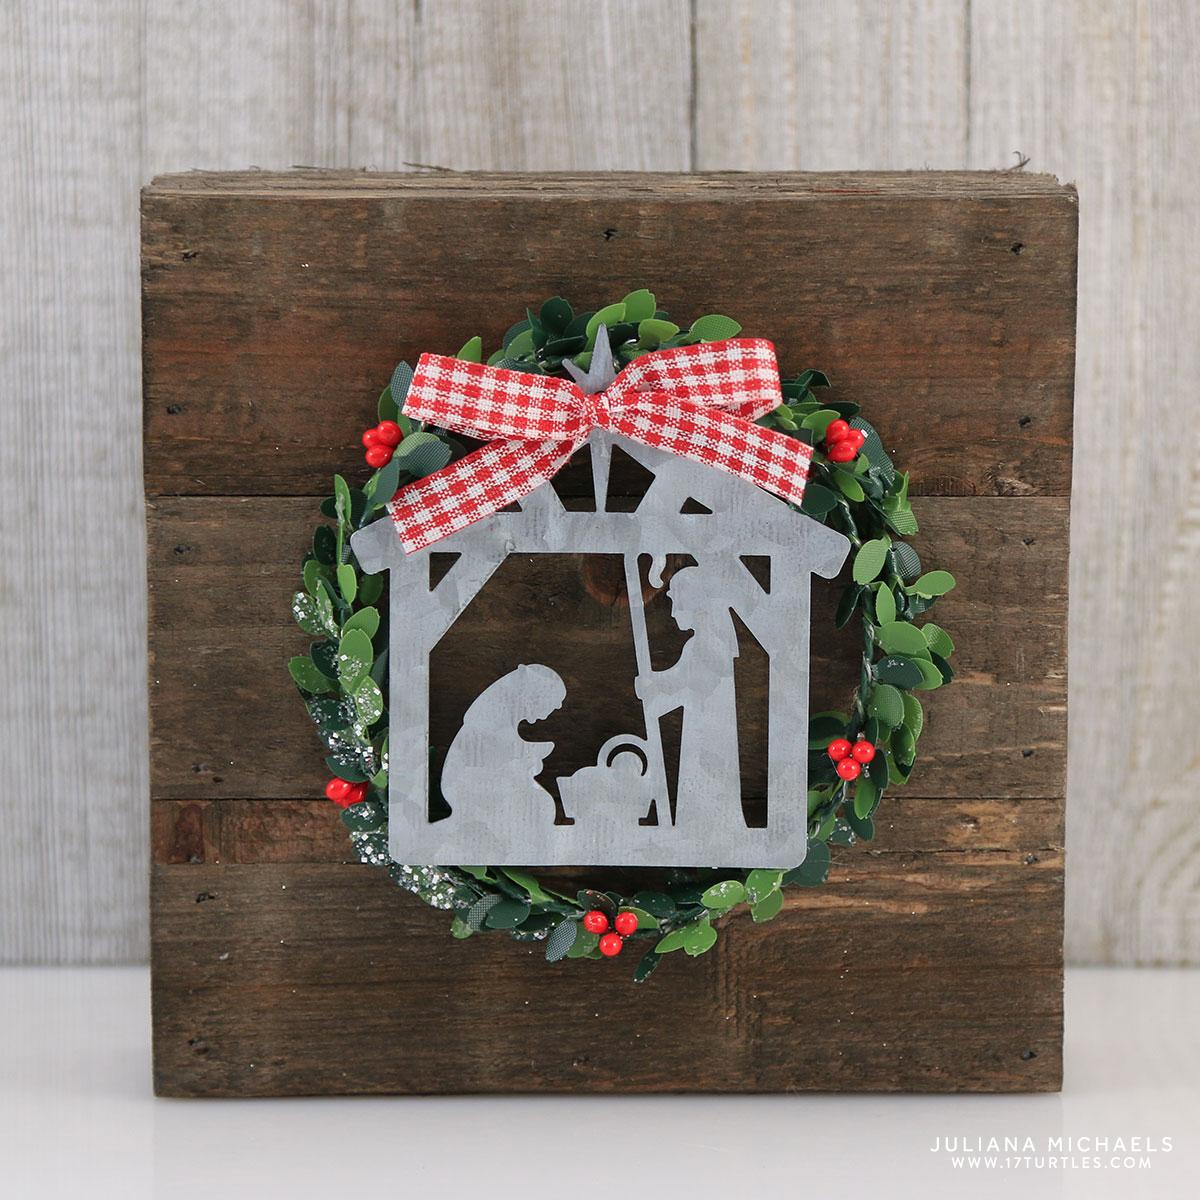 wood plank christmas nativity decoration. Black Bedroom Furniture Sets. Home Design Ideas